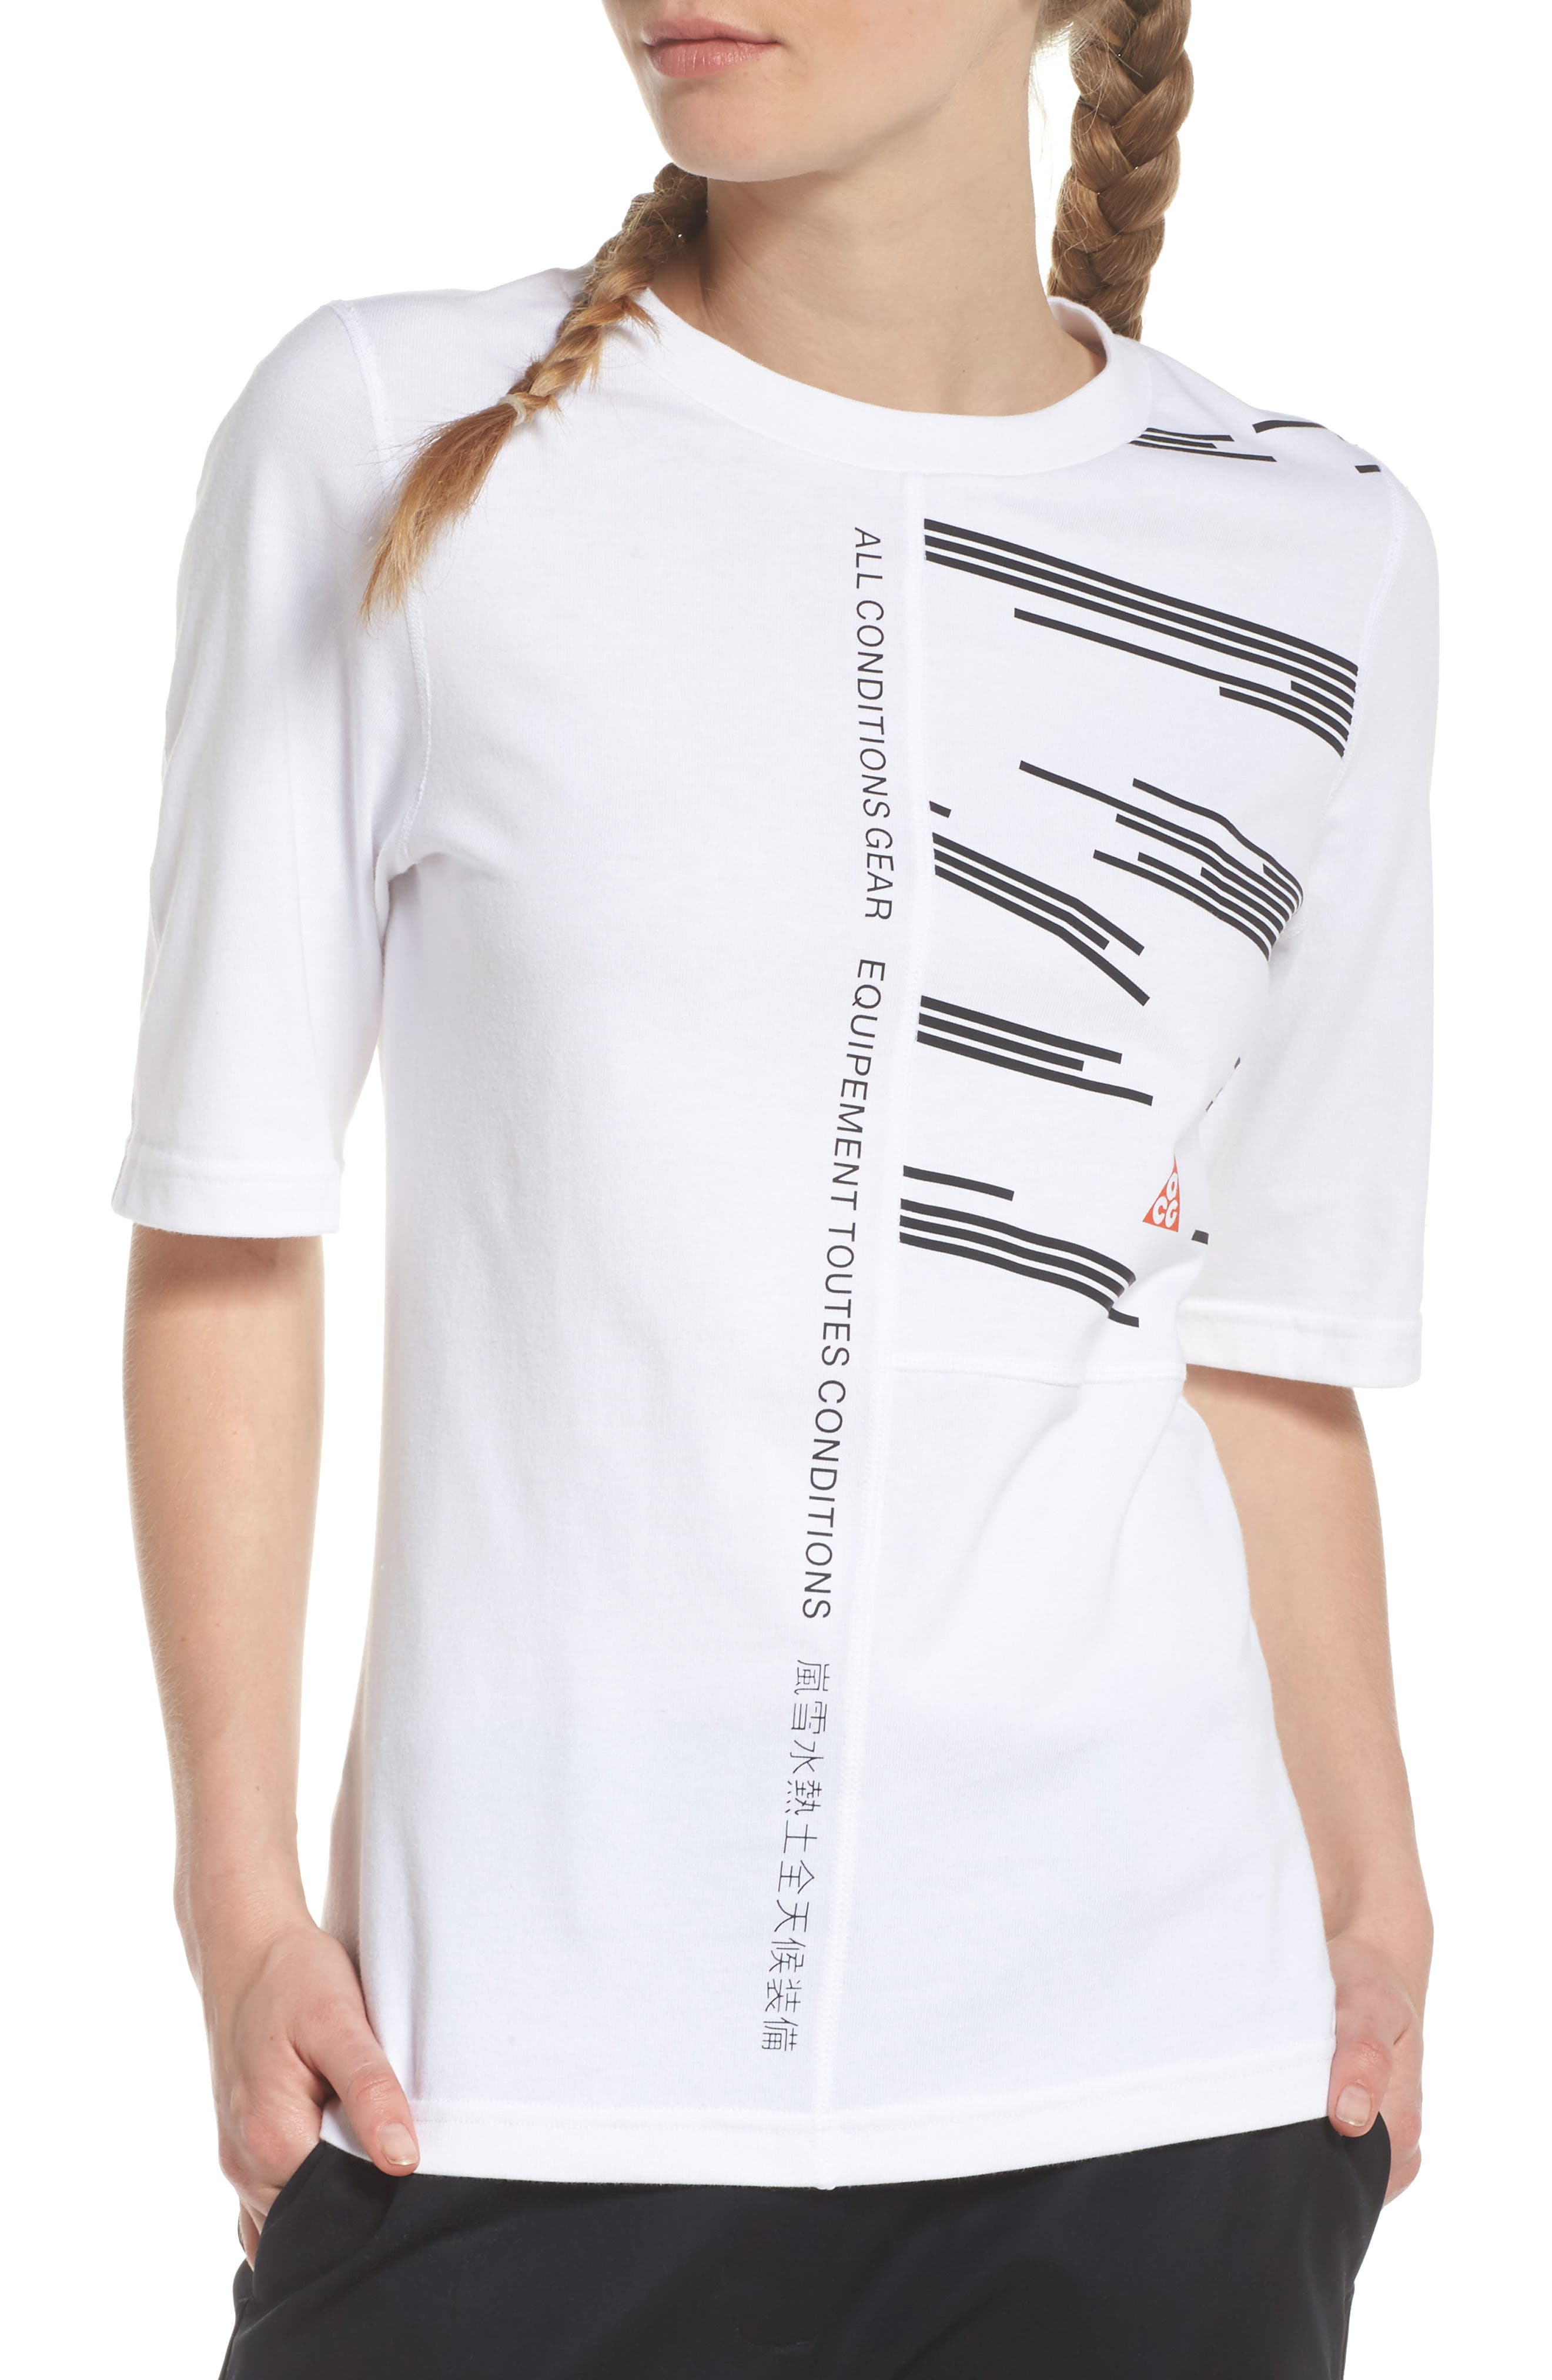 NikeLab AGC Tee,                         Main,                         color, White/ Black